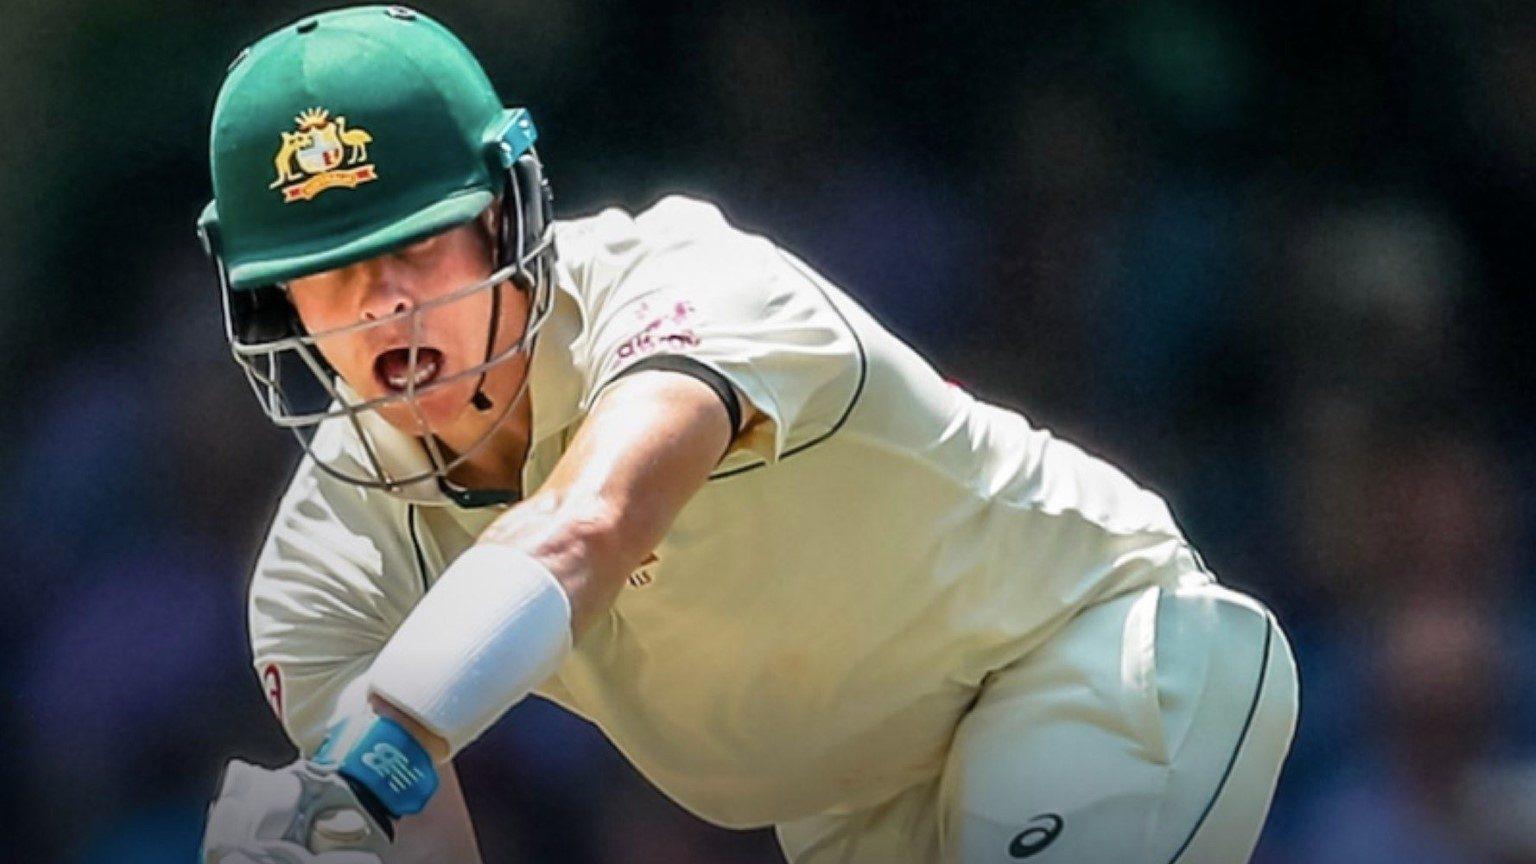 Australia vs India Test cricket series